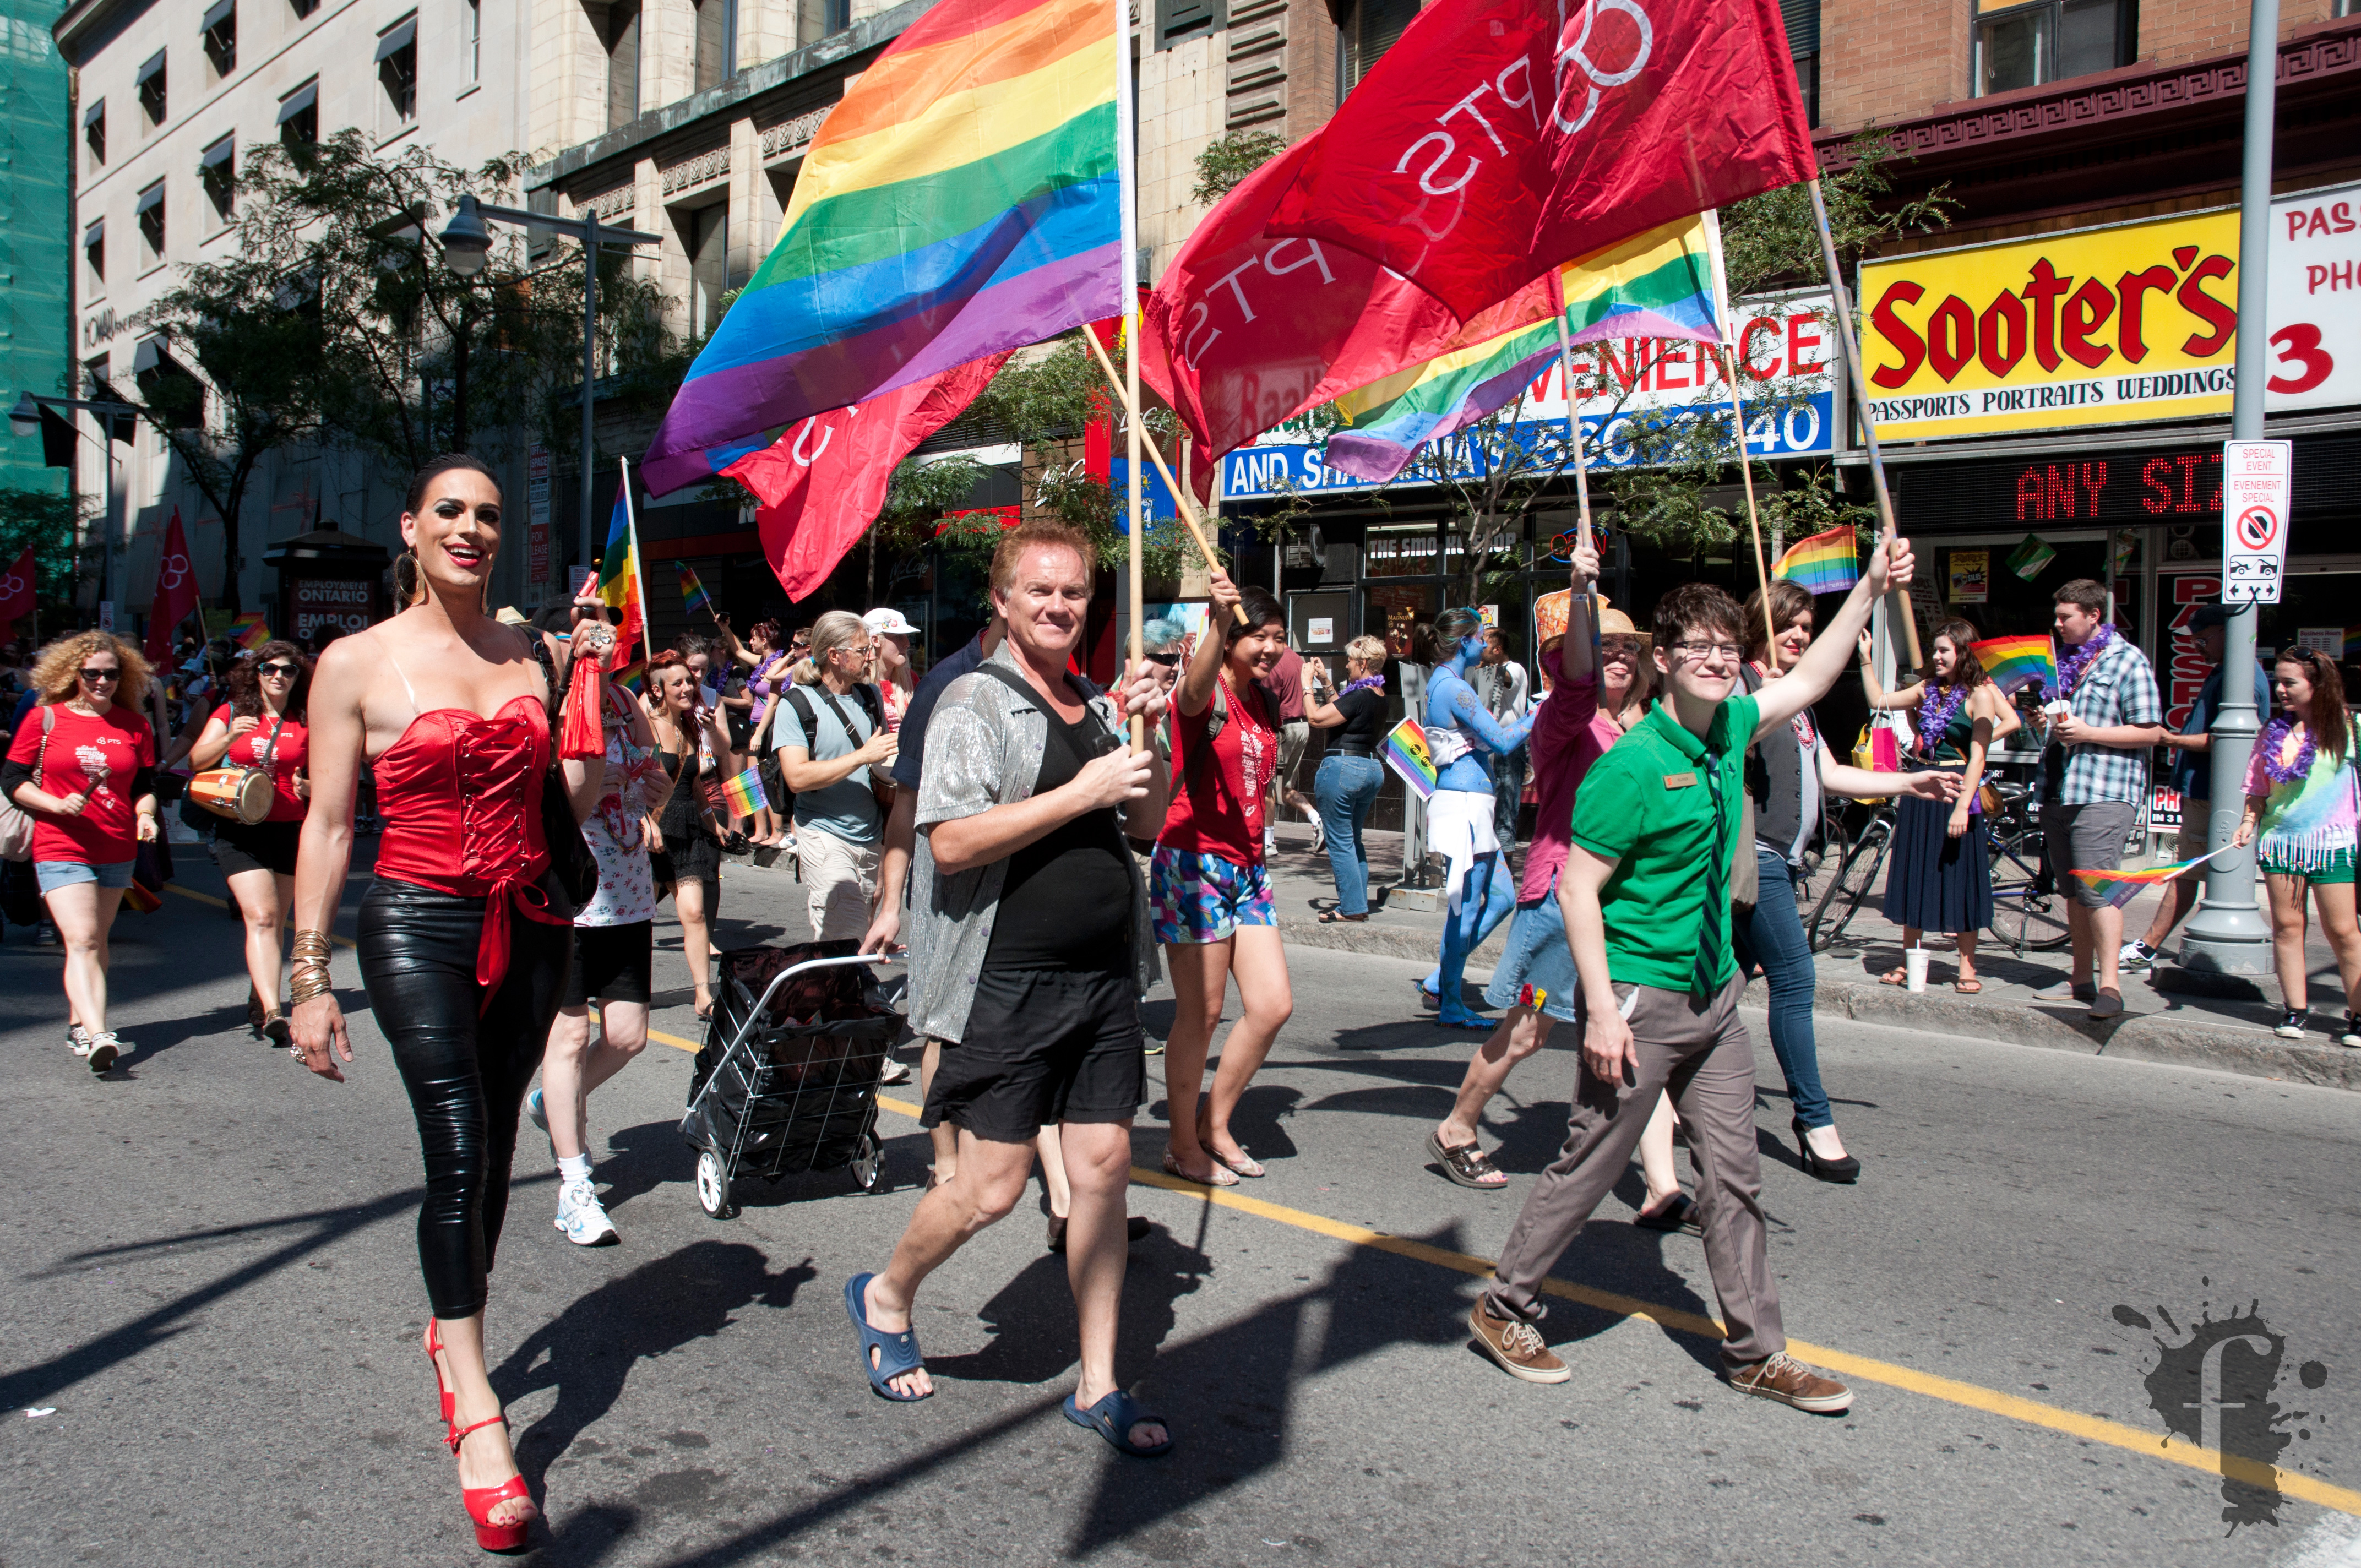 a vibrant gay community